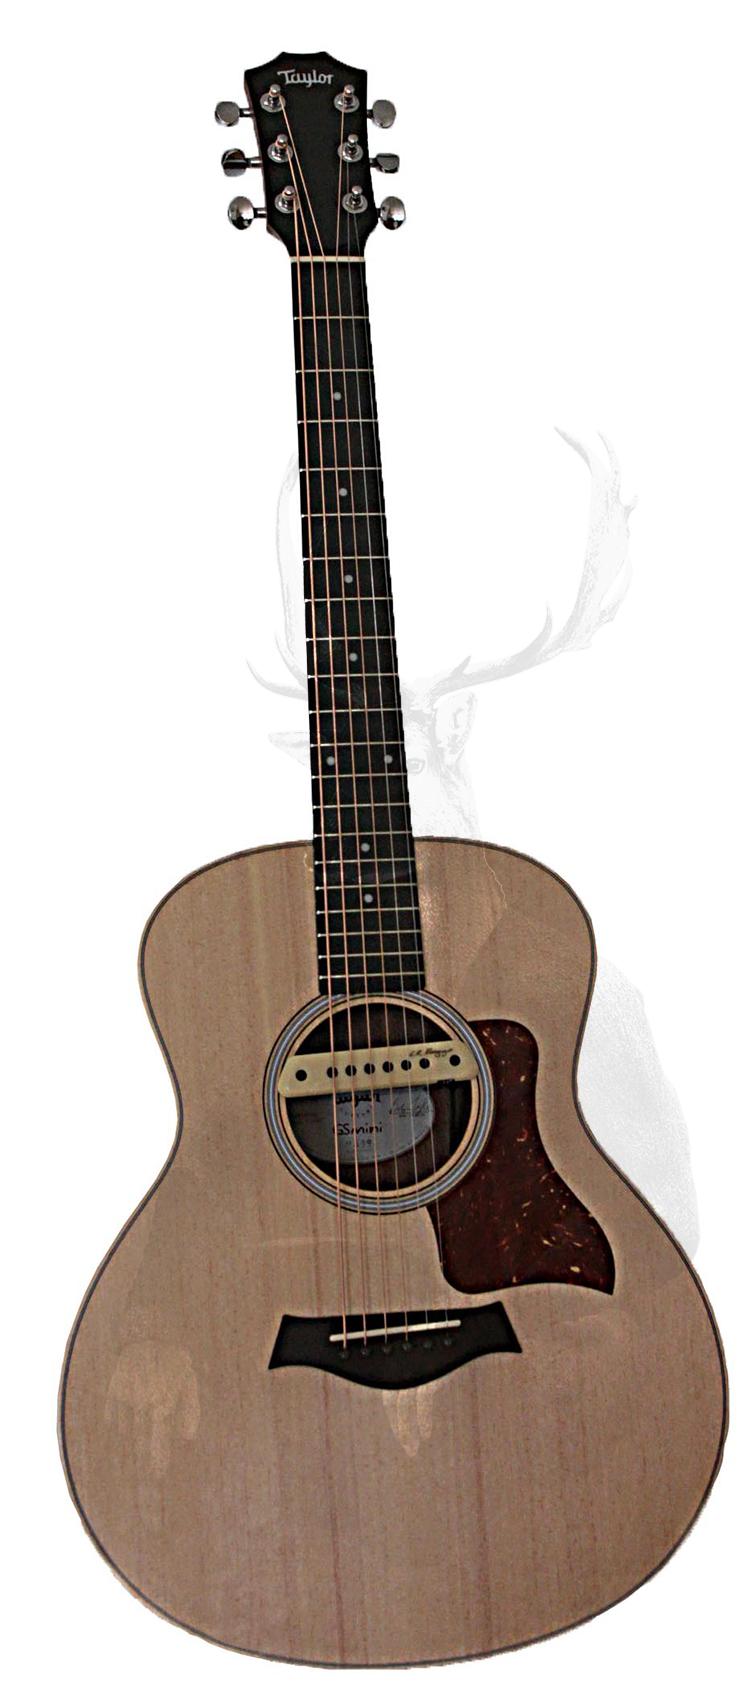 MWD 73; Contest; Gitarre acoustic; Original